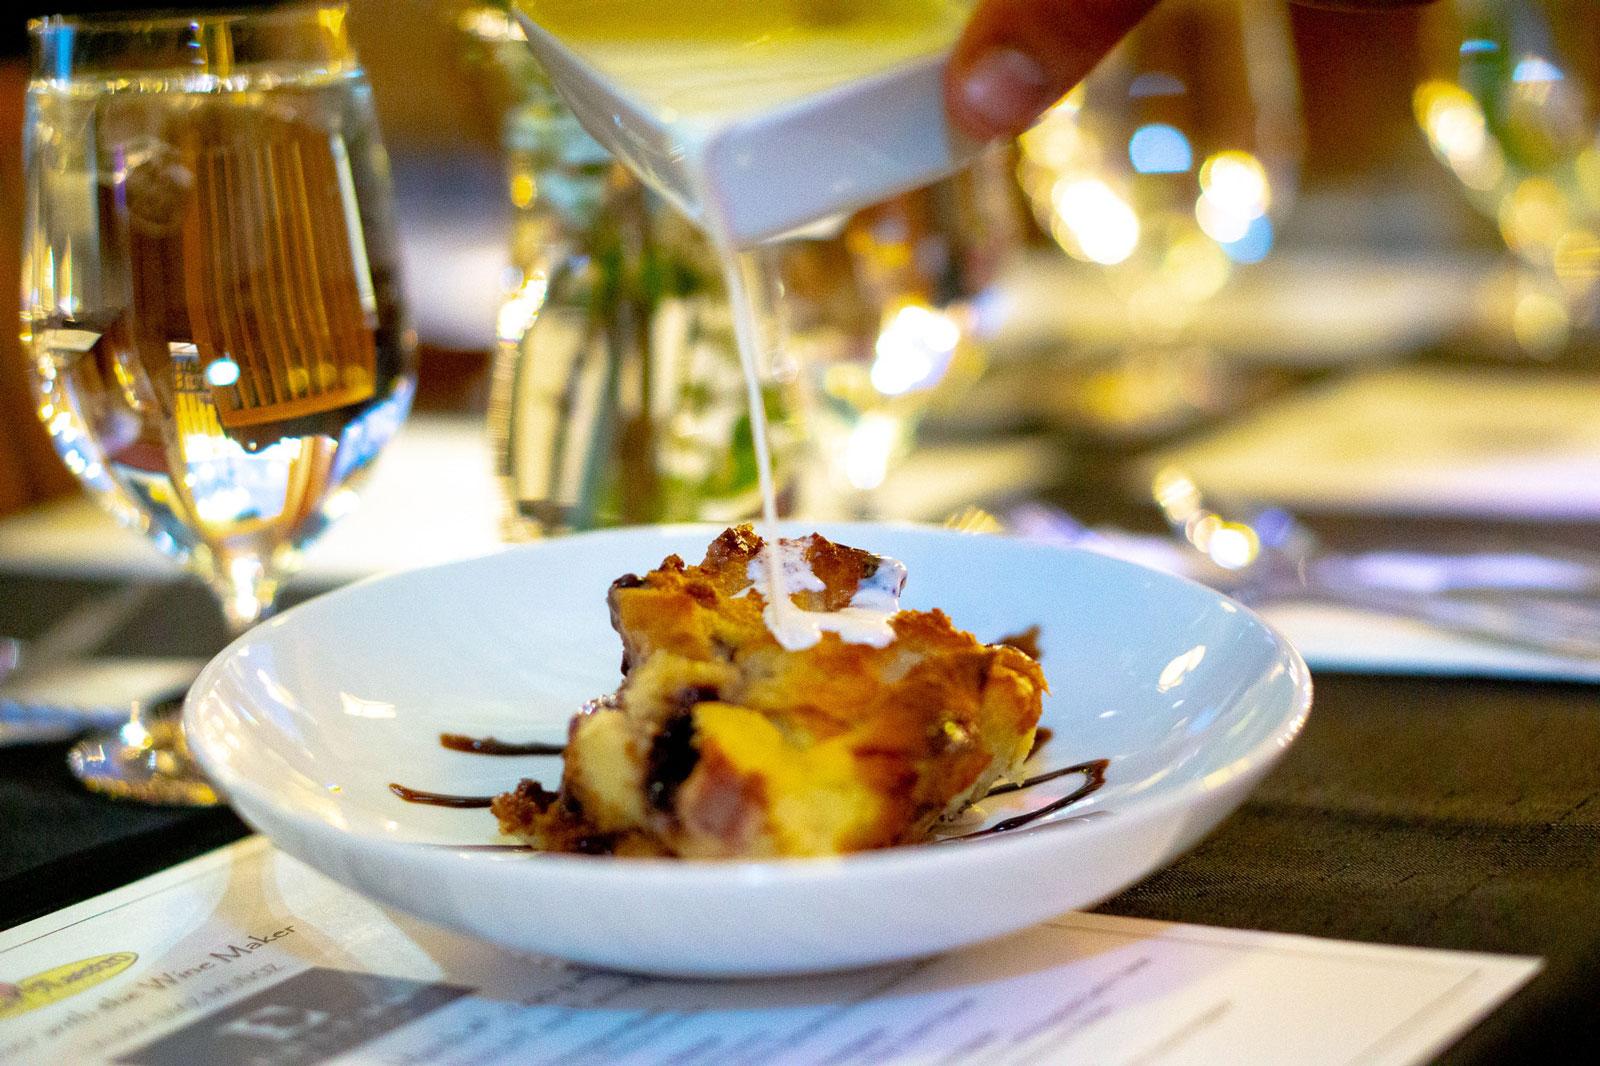 restaurant-social-media-tips-sassy-gourmet-wine.jpg